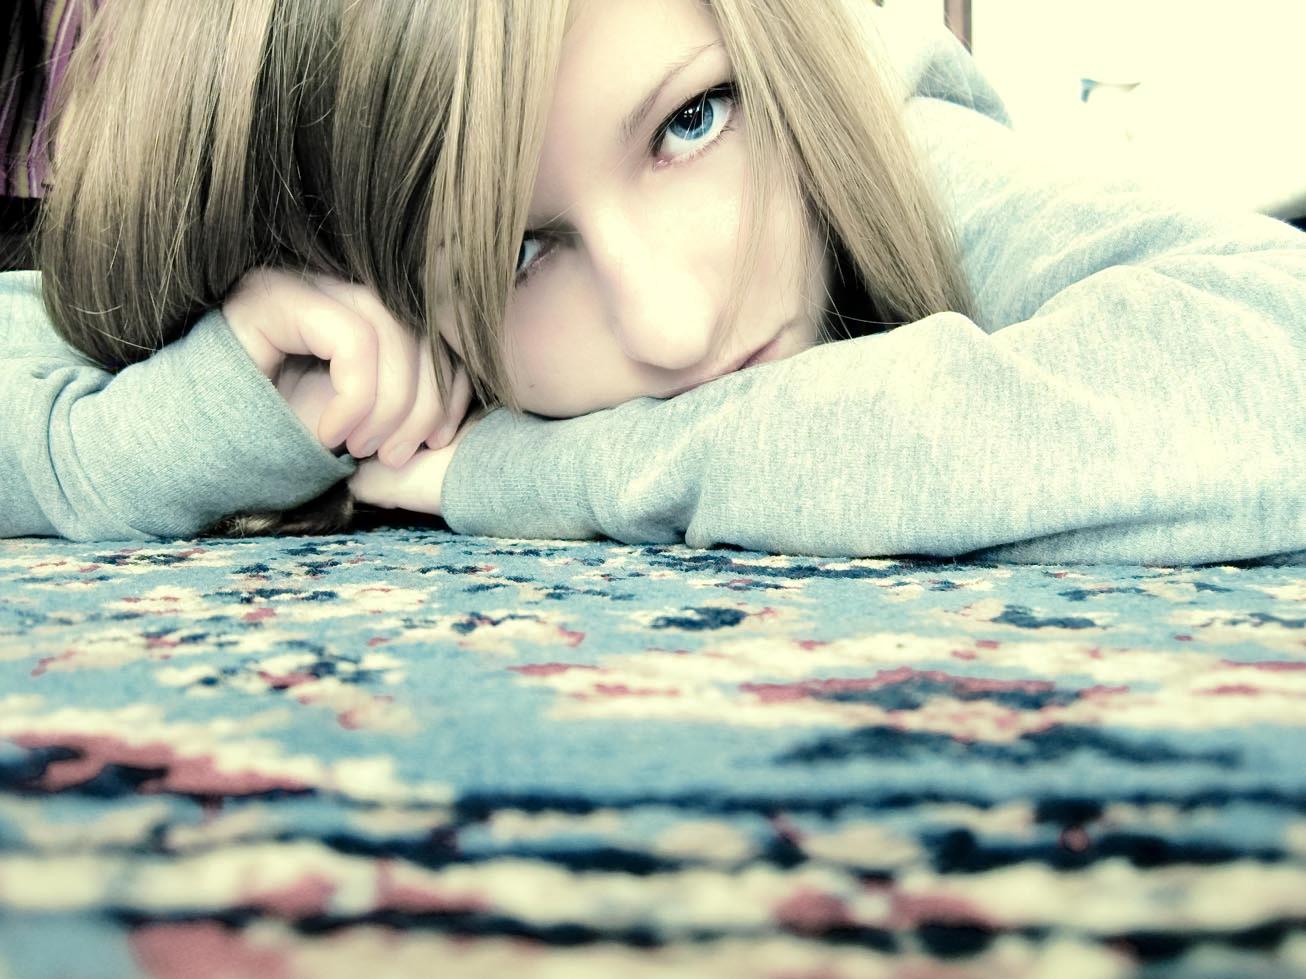 http://2.bp.blogspot.com/-8xOBOGy1eQk/TgJyBKBSW9I/AAAAAAAAAOM/OTXtRcImOq0/s1600/Blue_sadness_by_AvrilkaTff.jpg